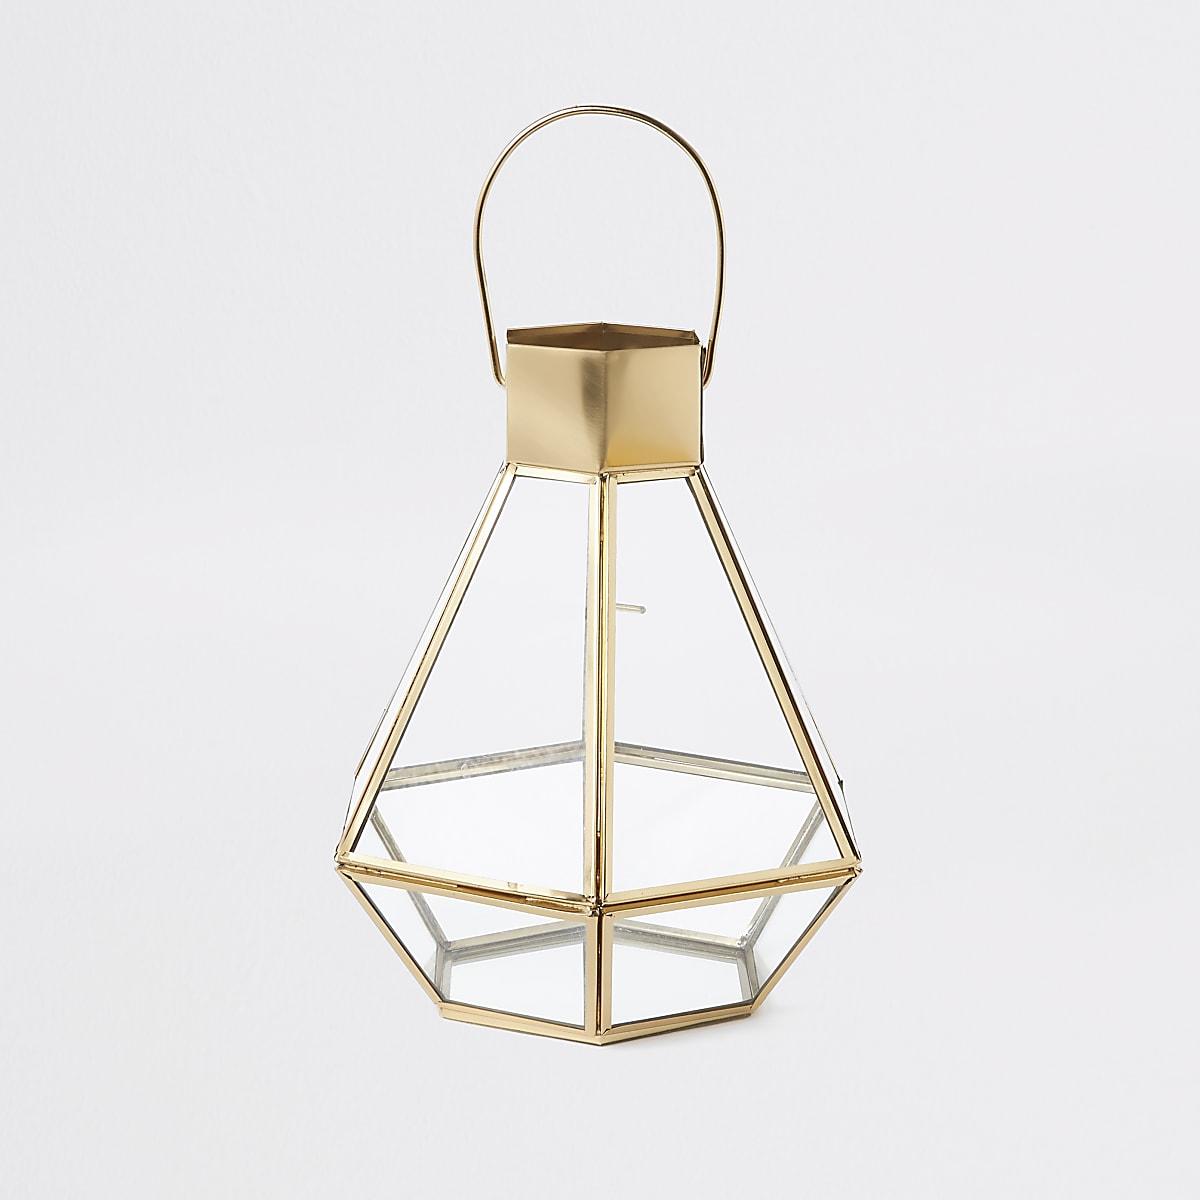 Goudkleurige kleine glazen lantaarn